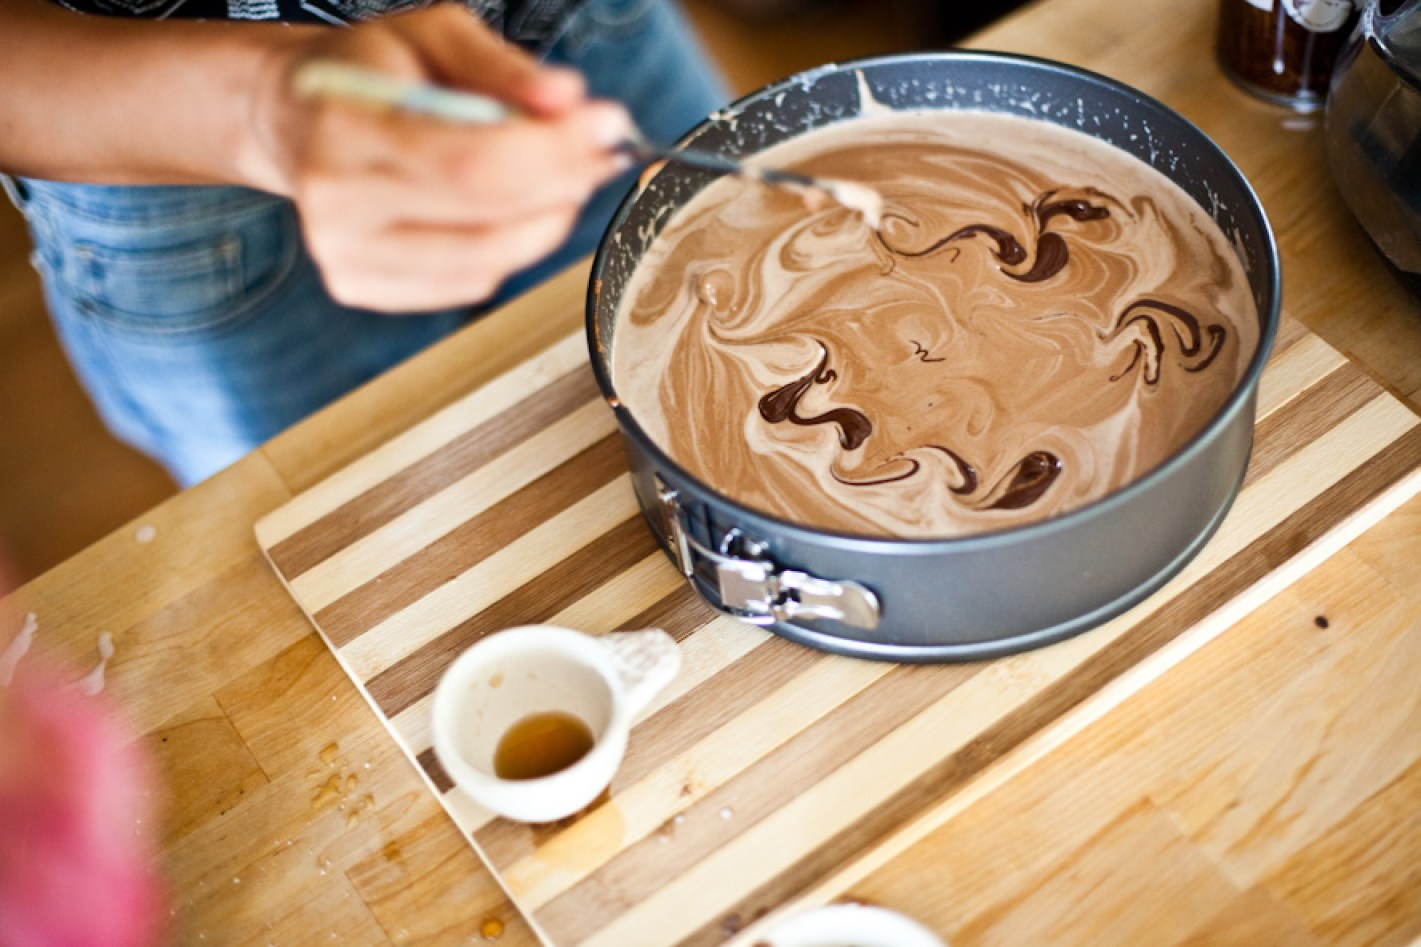 No Bake Vegan Chocolate Peanut Butter Pie